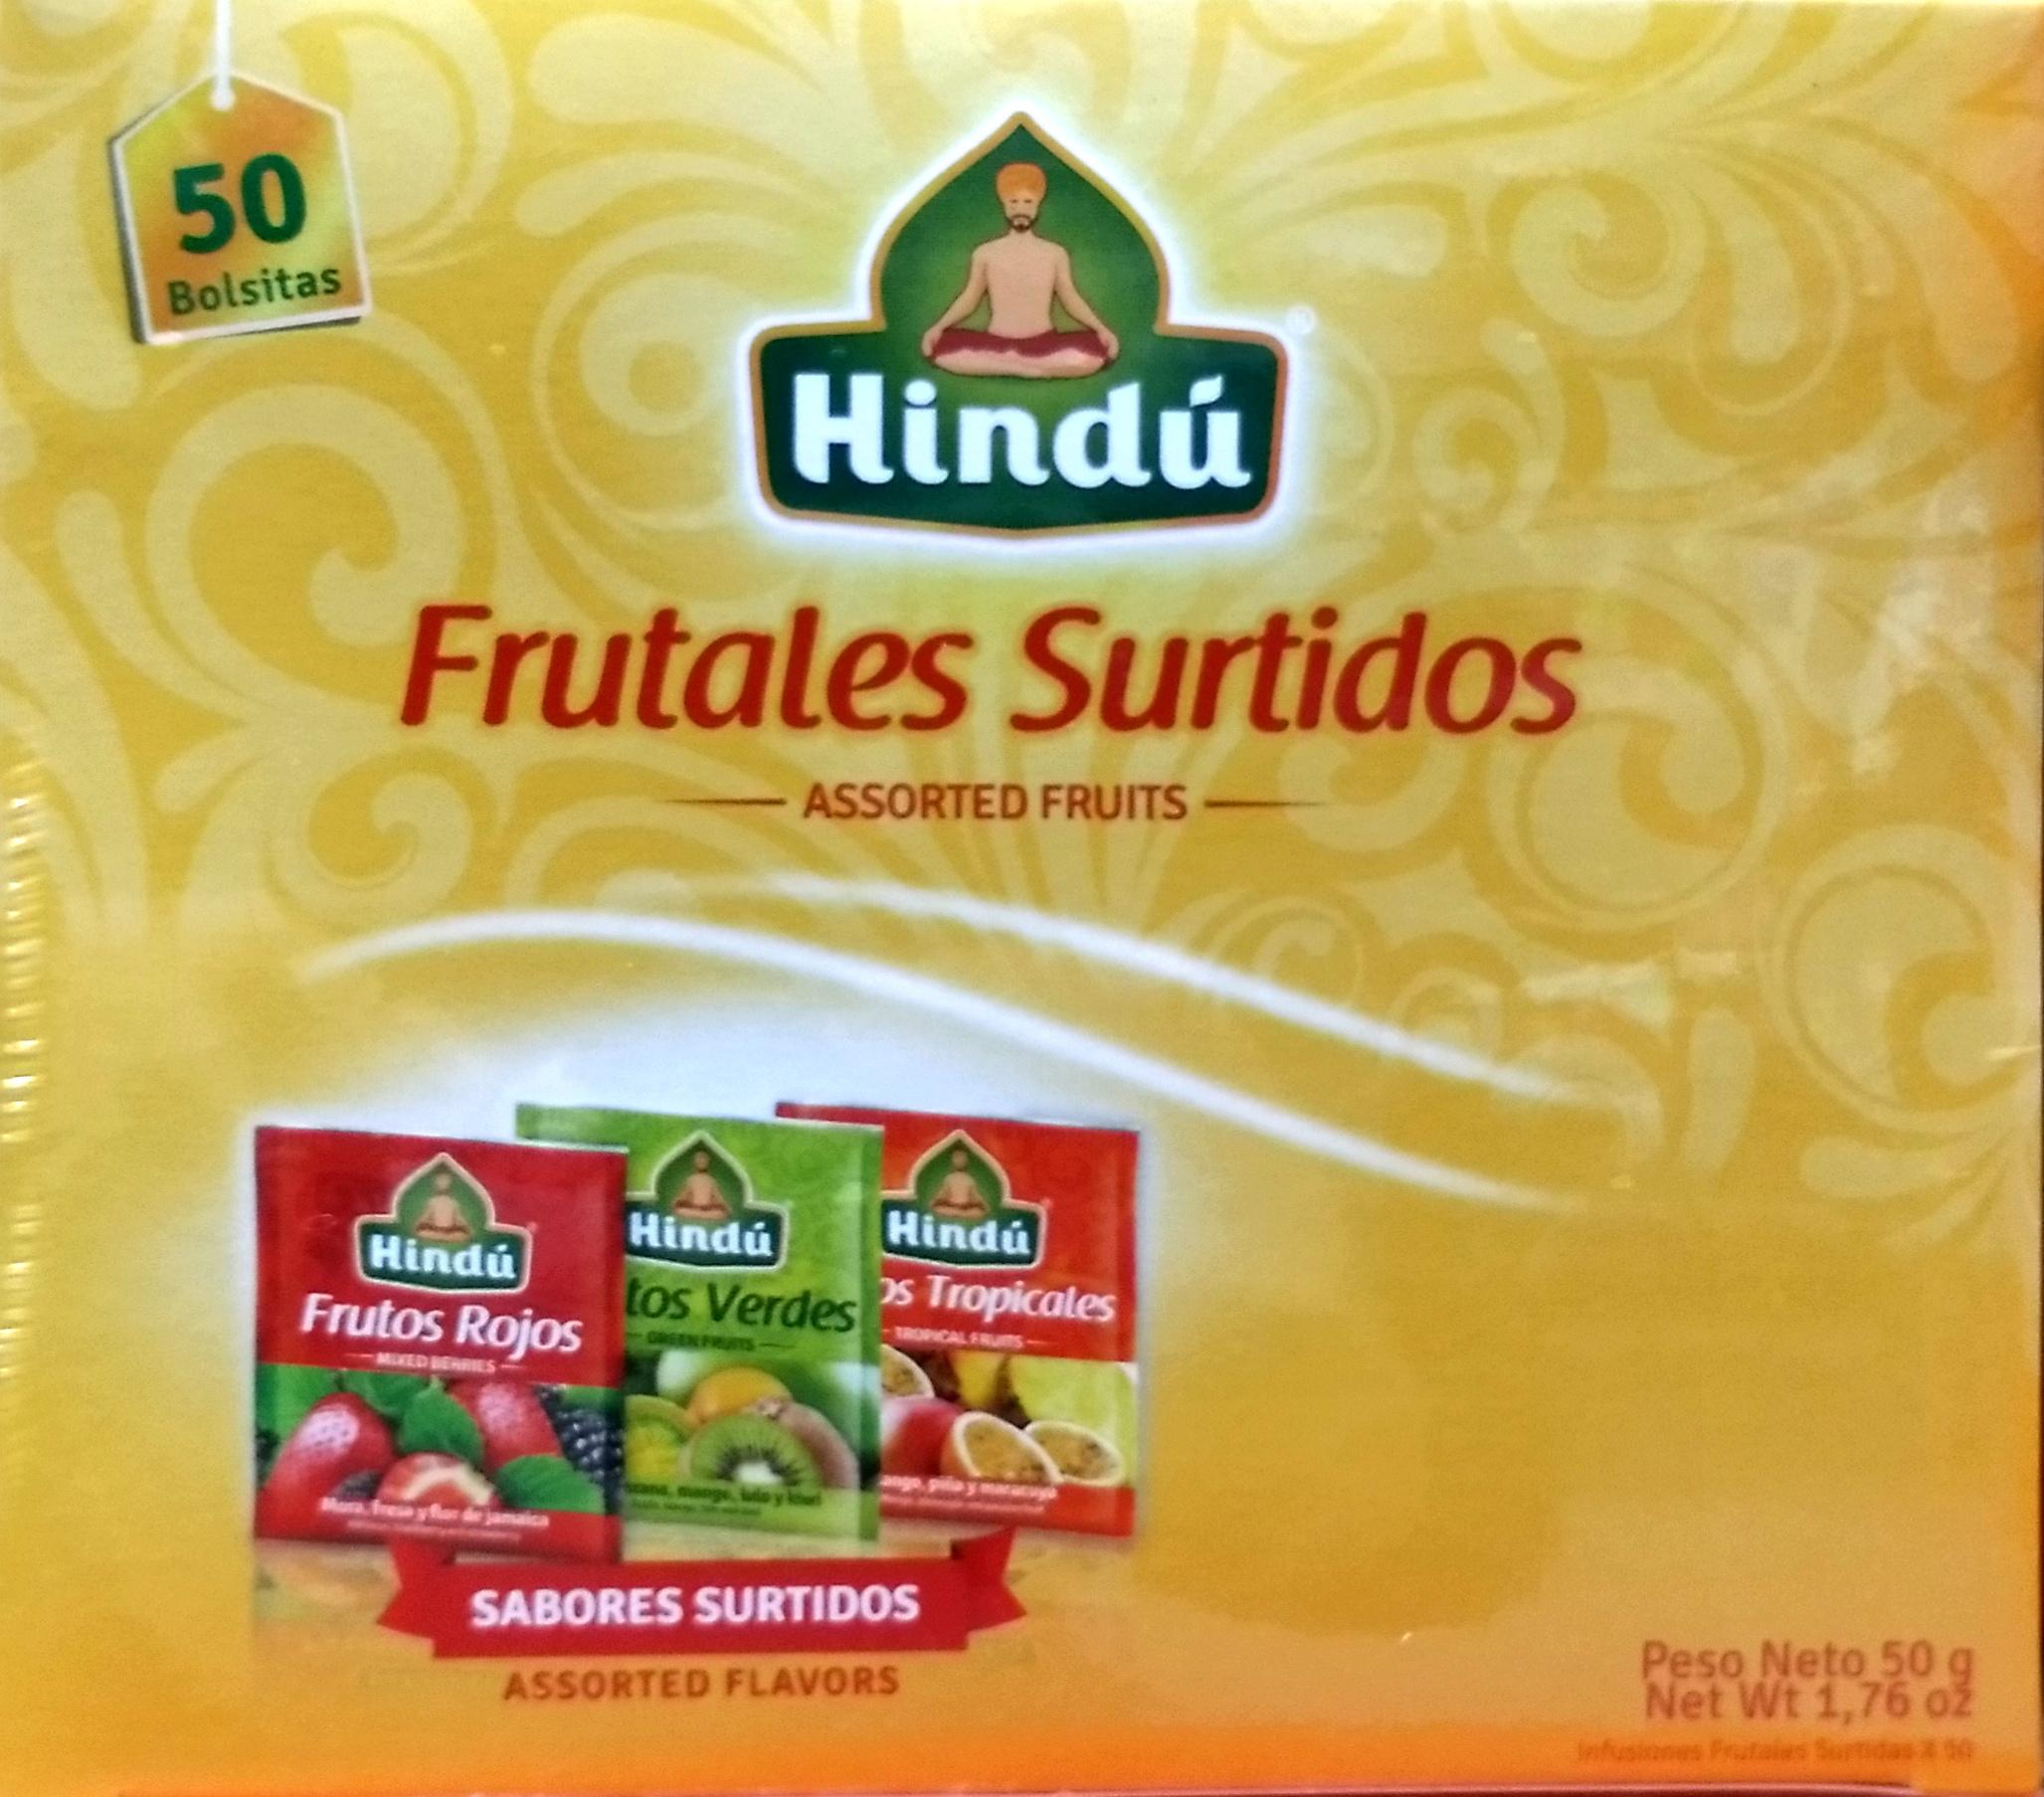 Infusion Hindu Frutales Surtidos X50u 50g